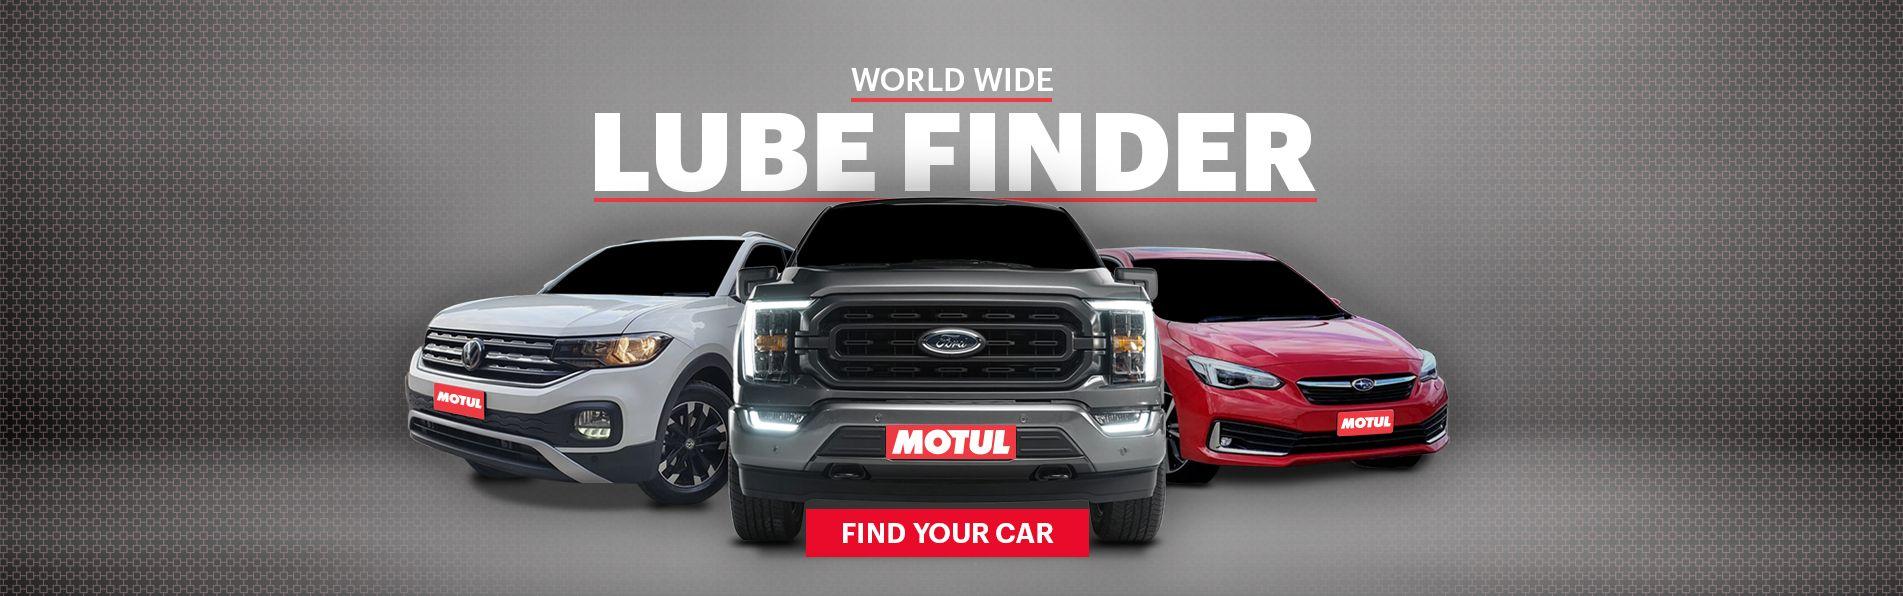 Lube-Finder-VW